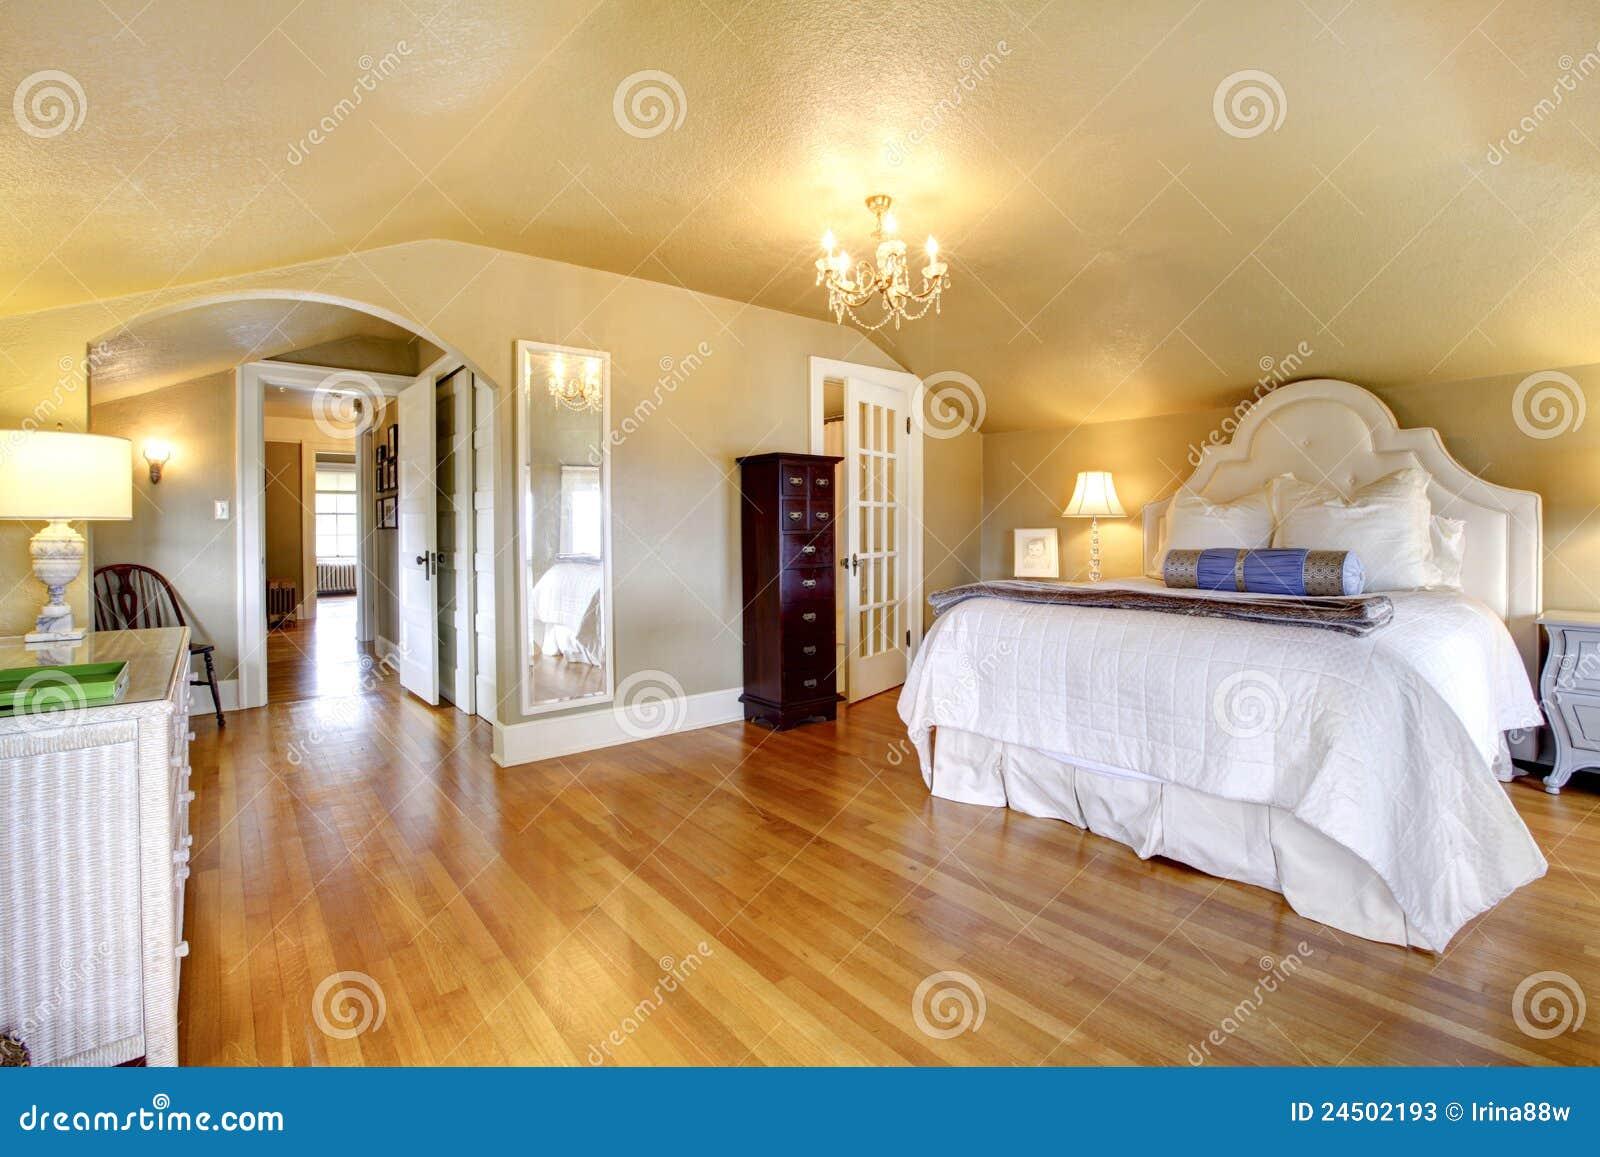 Luxury Elegant Gold Bedroom Interior Stock Image - Image of ...